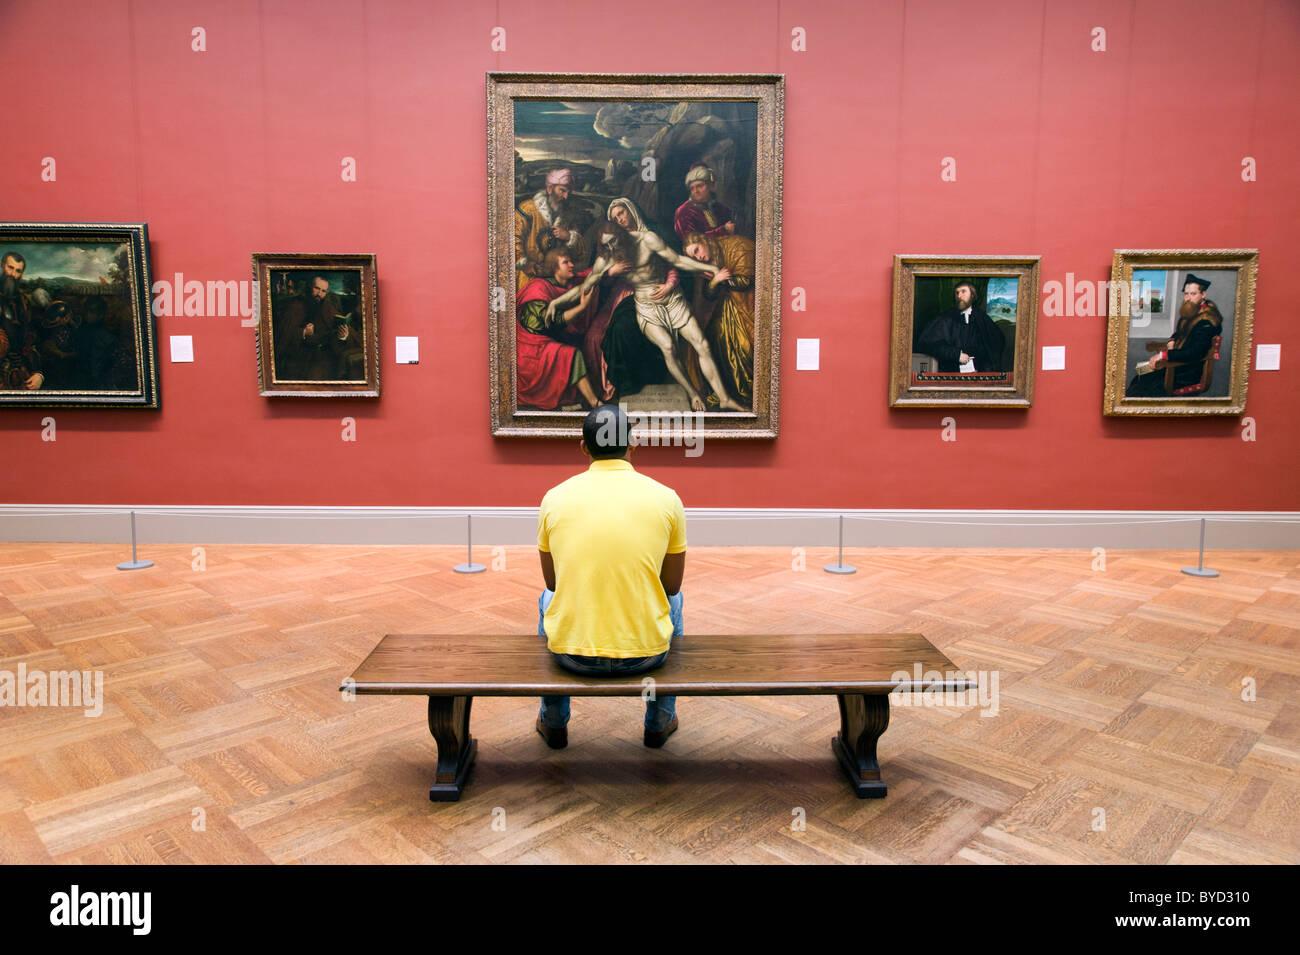 The Metropolitan Museum of Art, New York City, USA - Stock Image